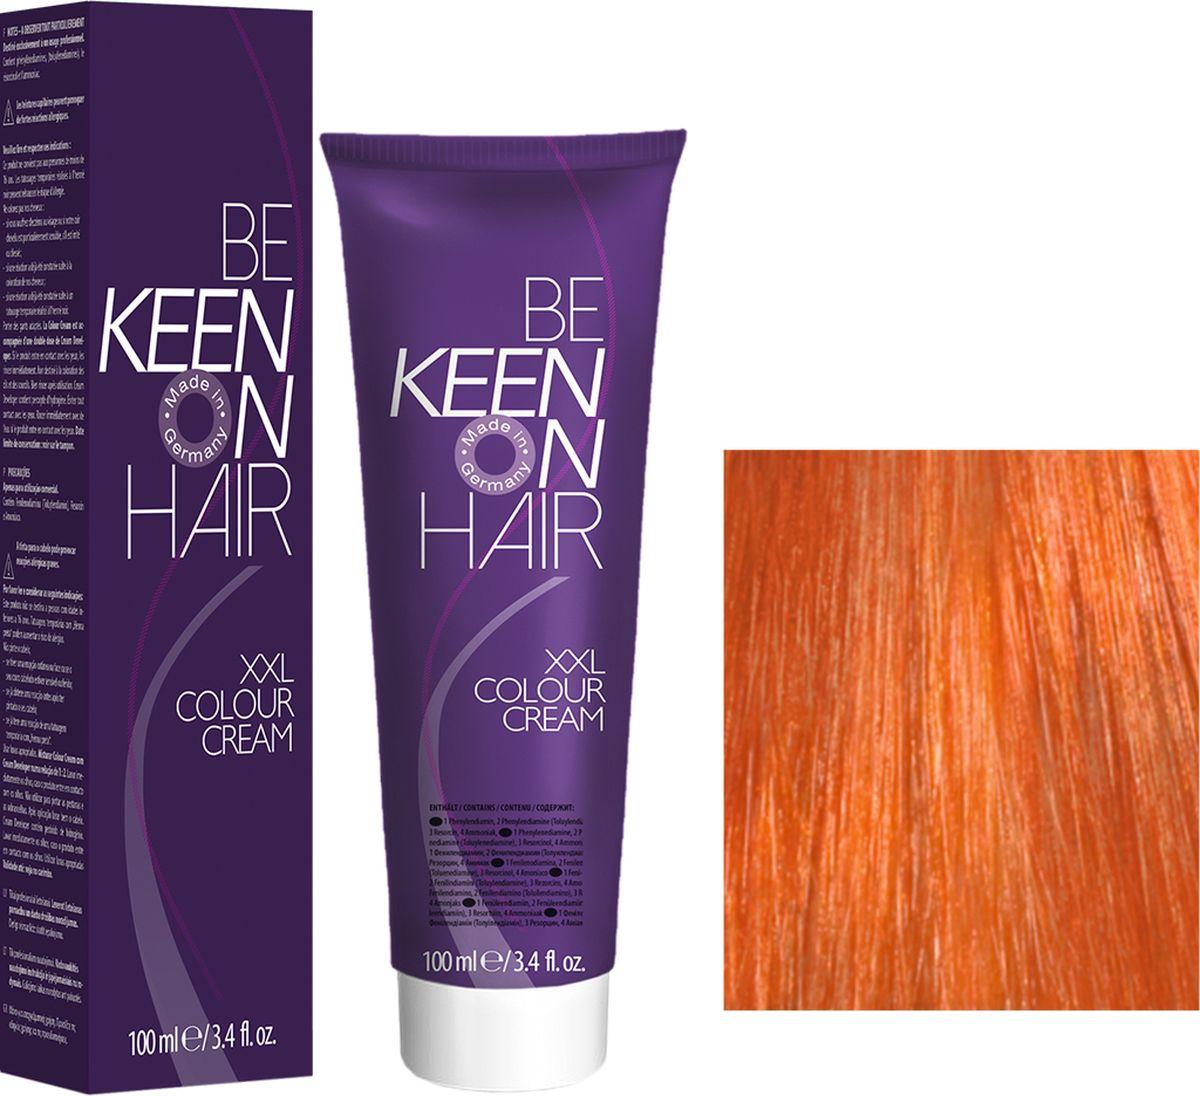 Keen Краска для волос 7.43 Натуральный медно-золотистый блондин Mittelblond Kupfer-Gold, 100 мл